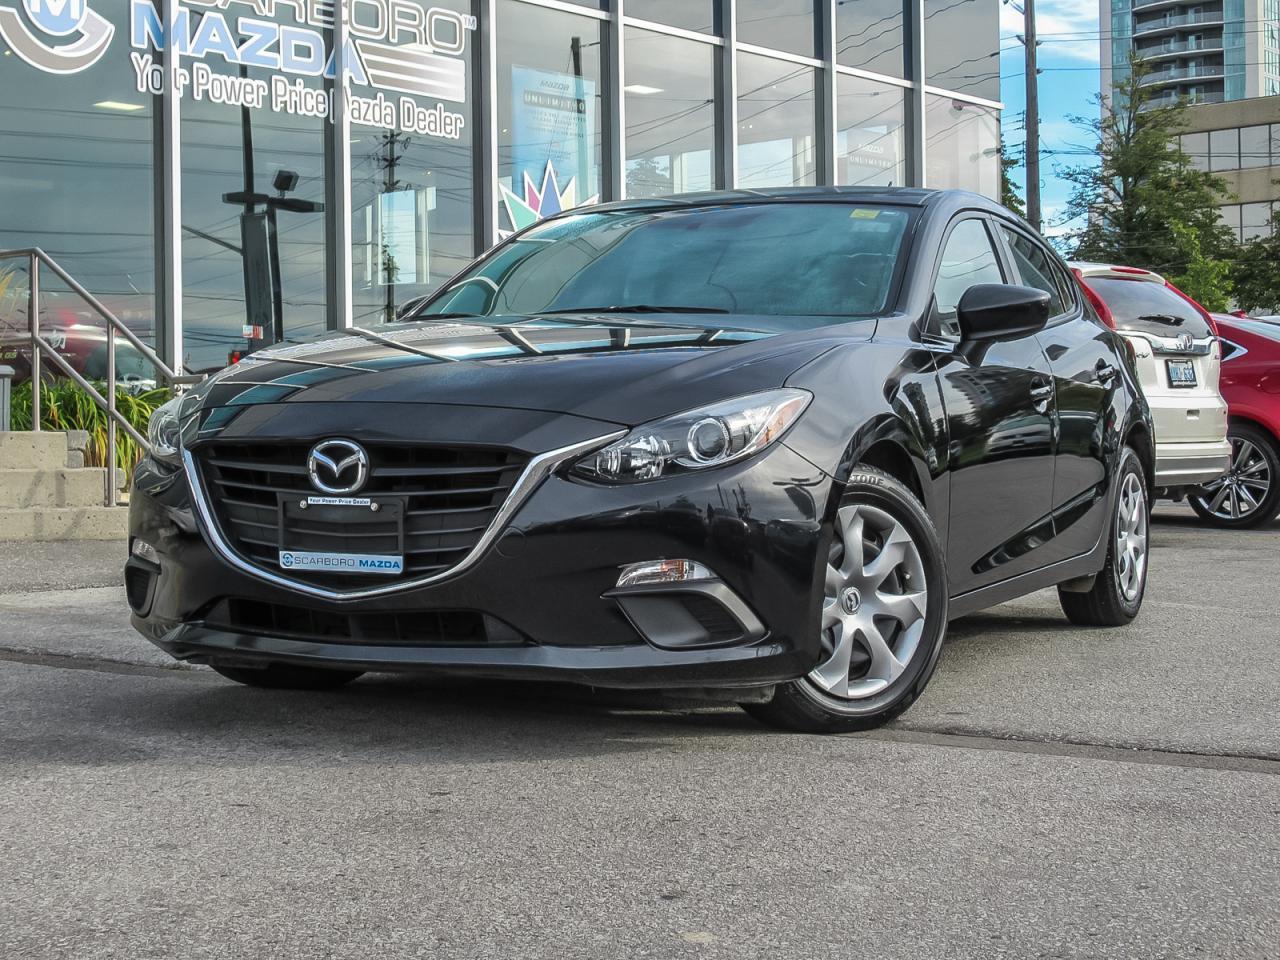 2015 Mazda MAZDA3 LOAD AUTOMATIC HATCHBACK